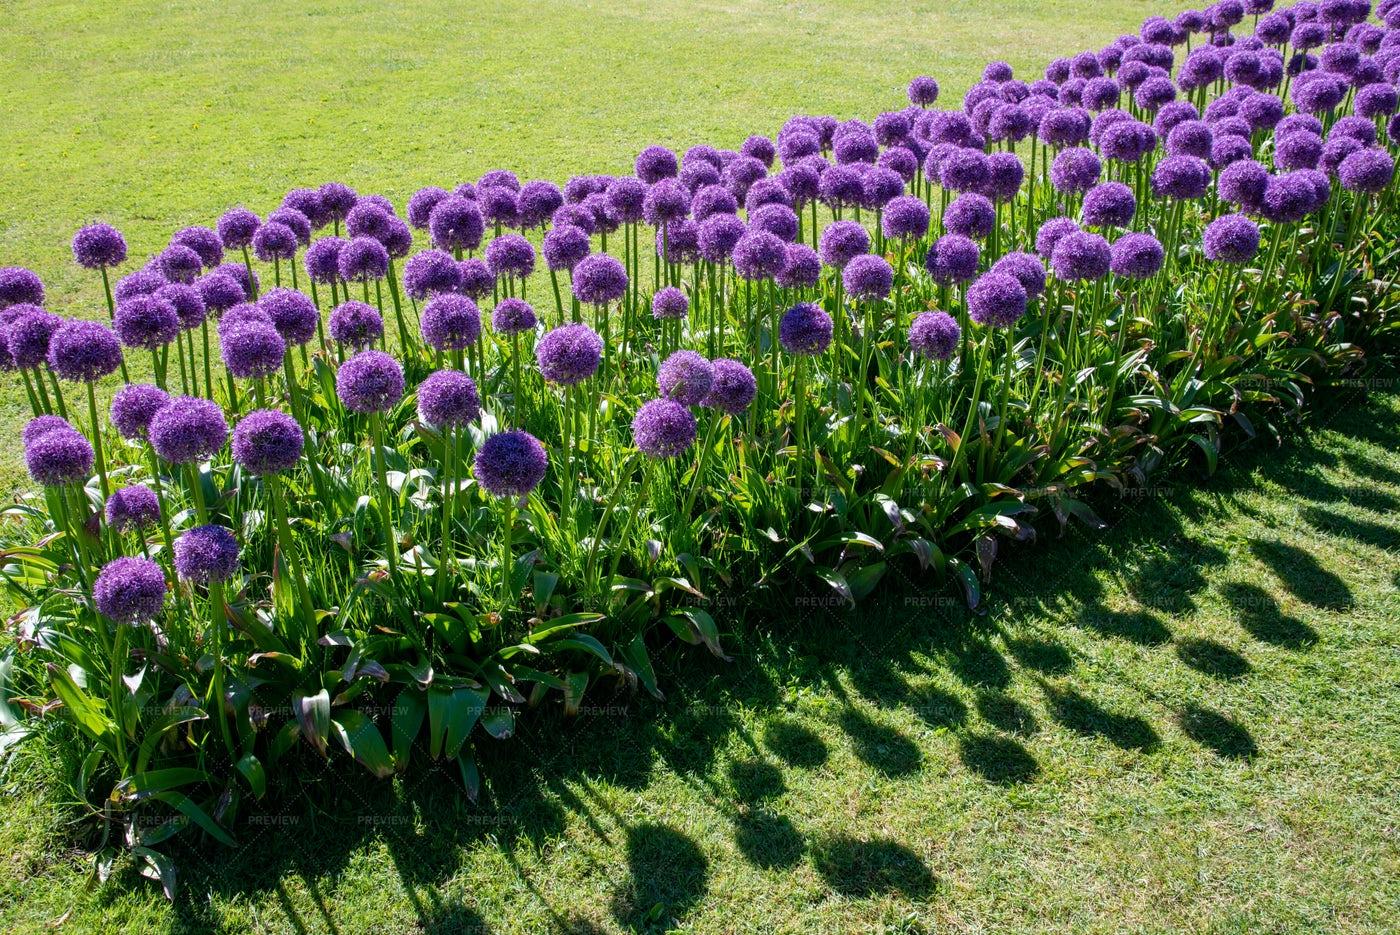 Giant Allium Flowers In A Row: Stock Photos